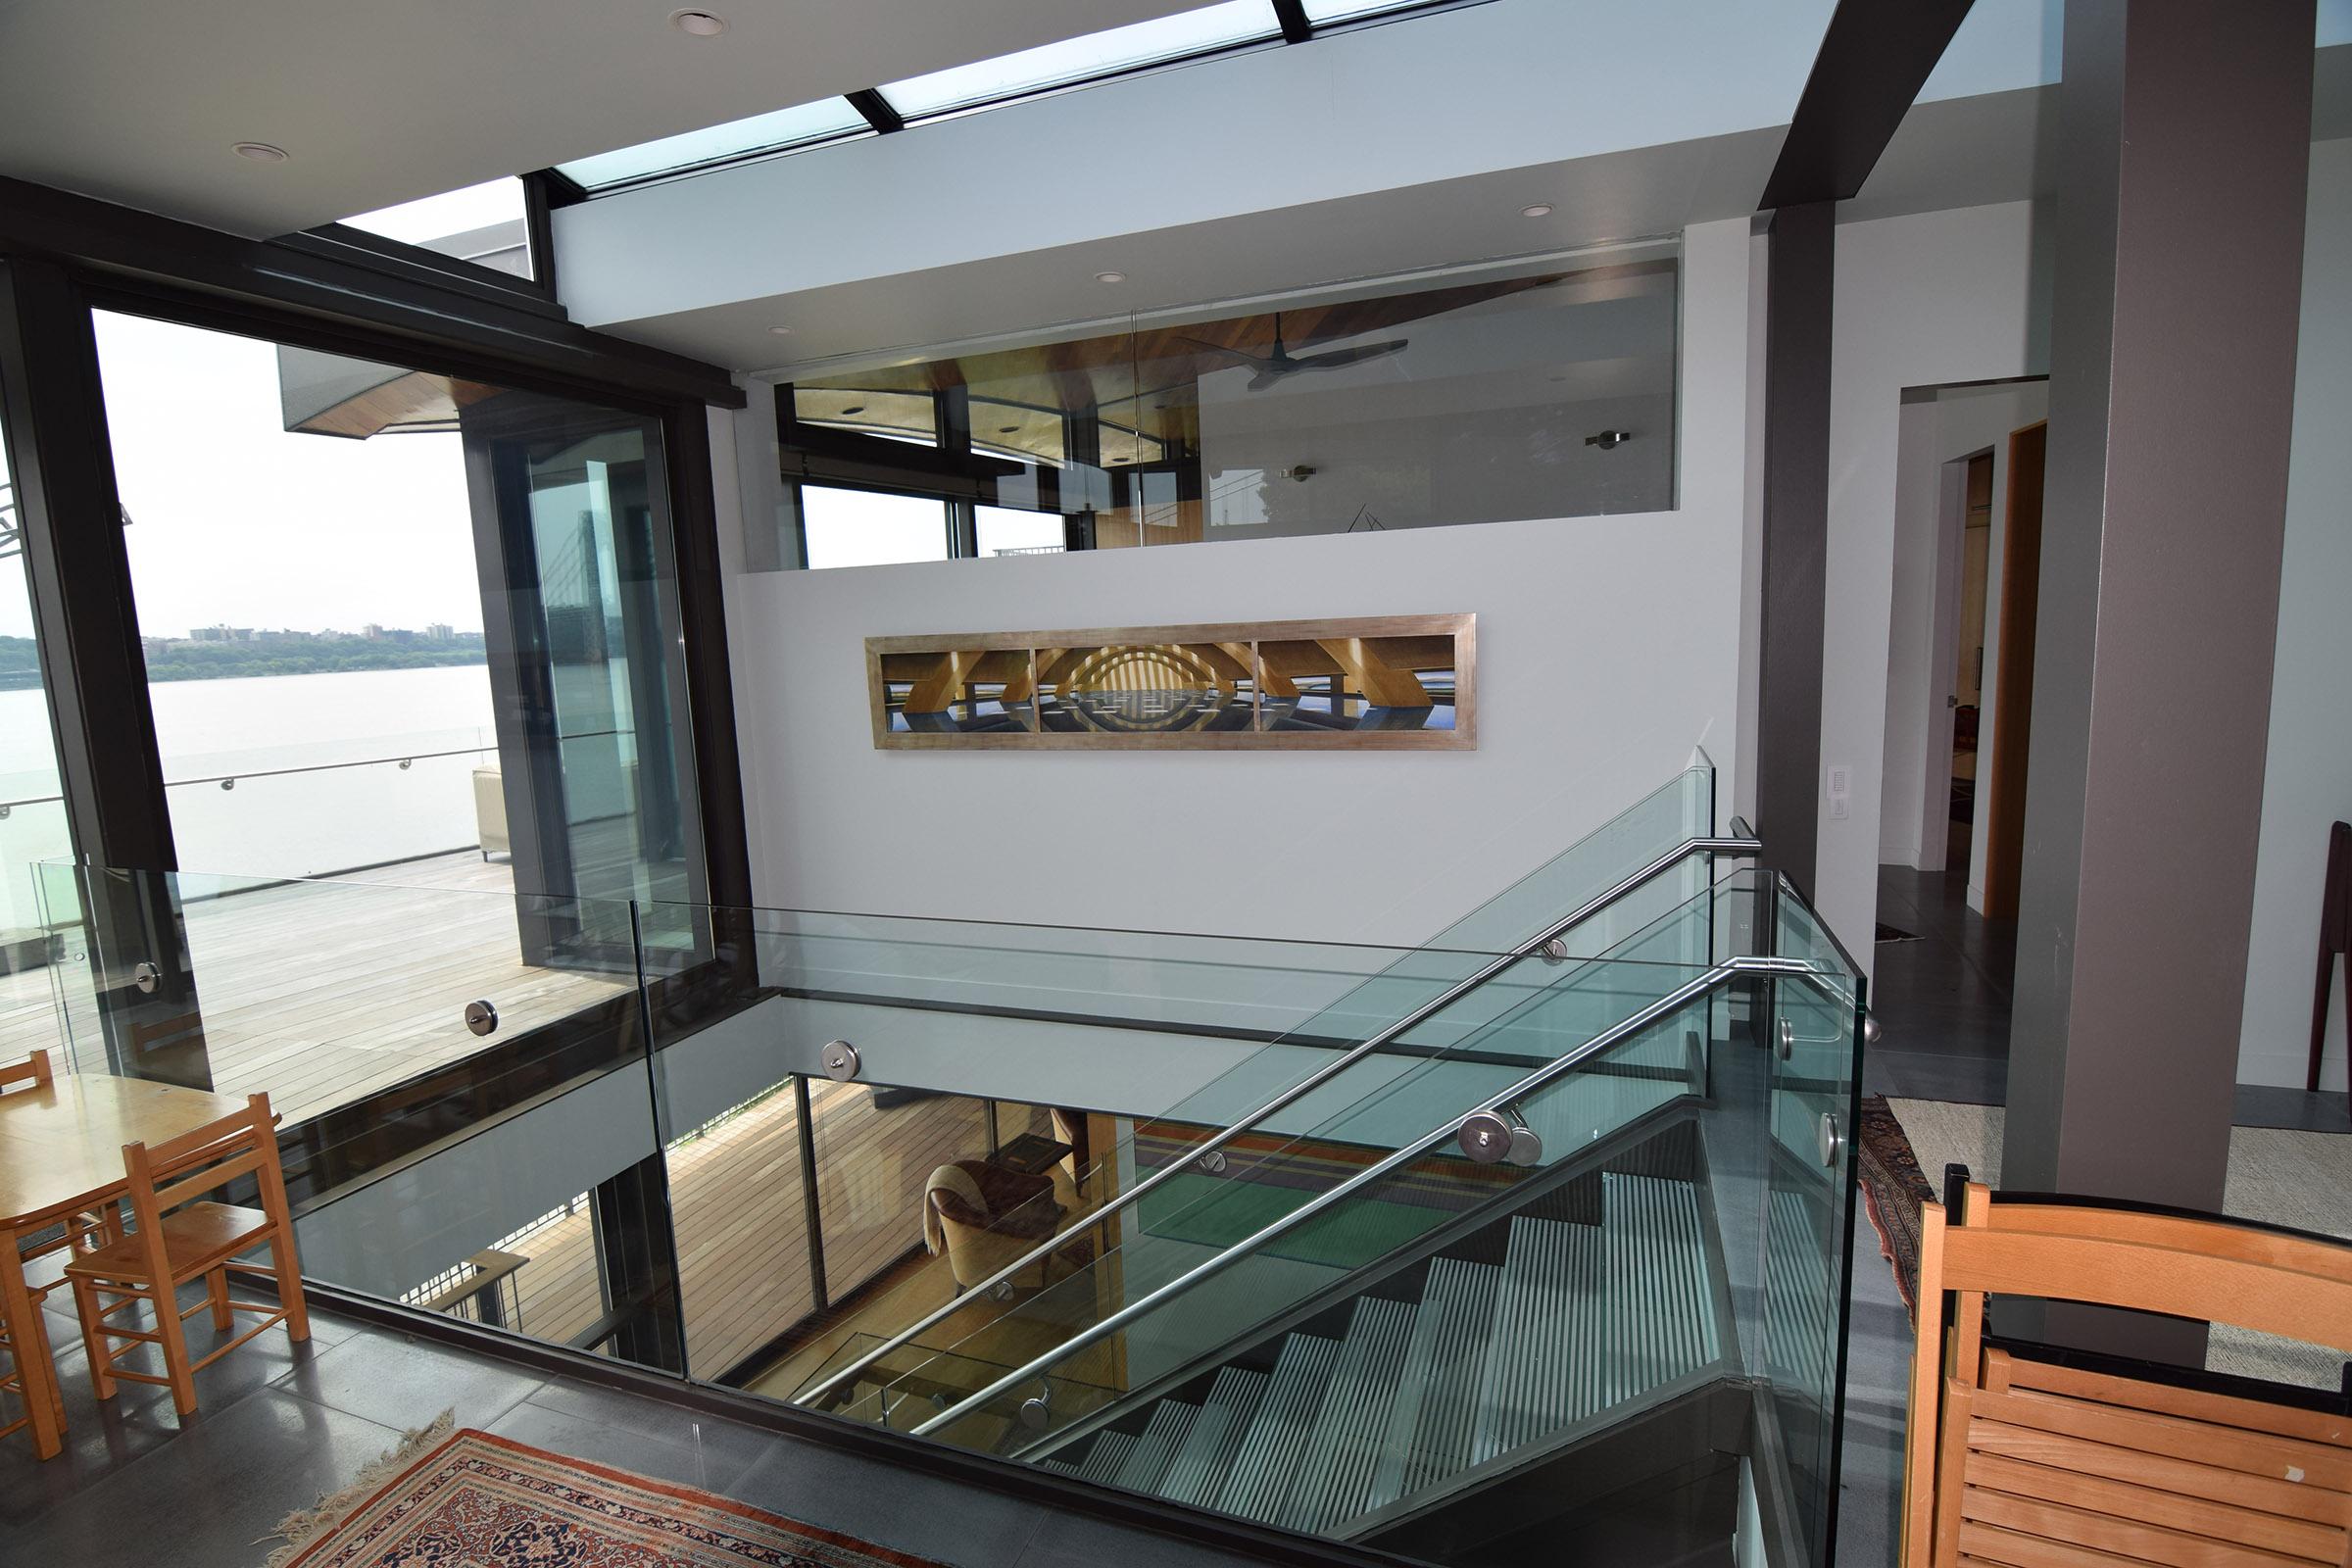 Upstairs view to open Rift Anigre Custom Pocket Door